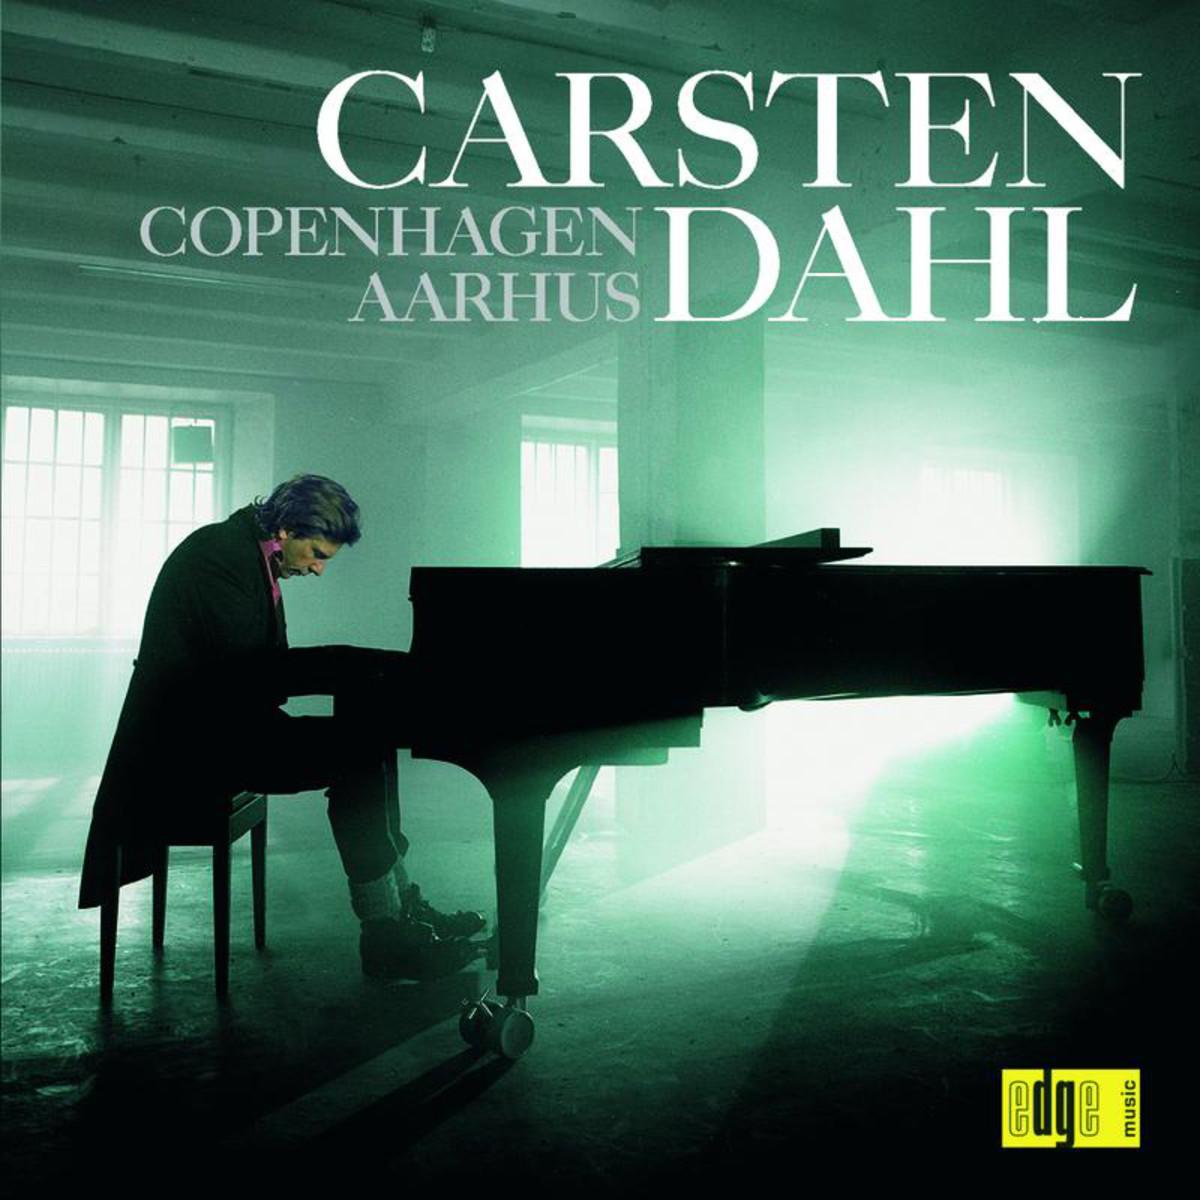 Carsten Dahl - Grace